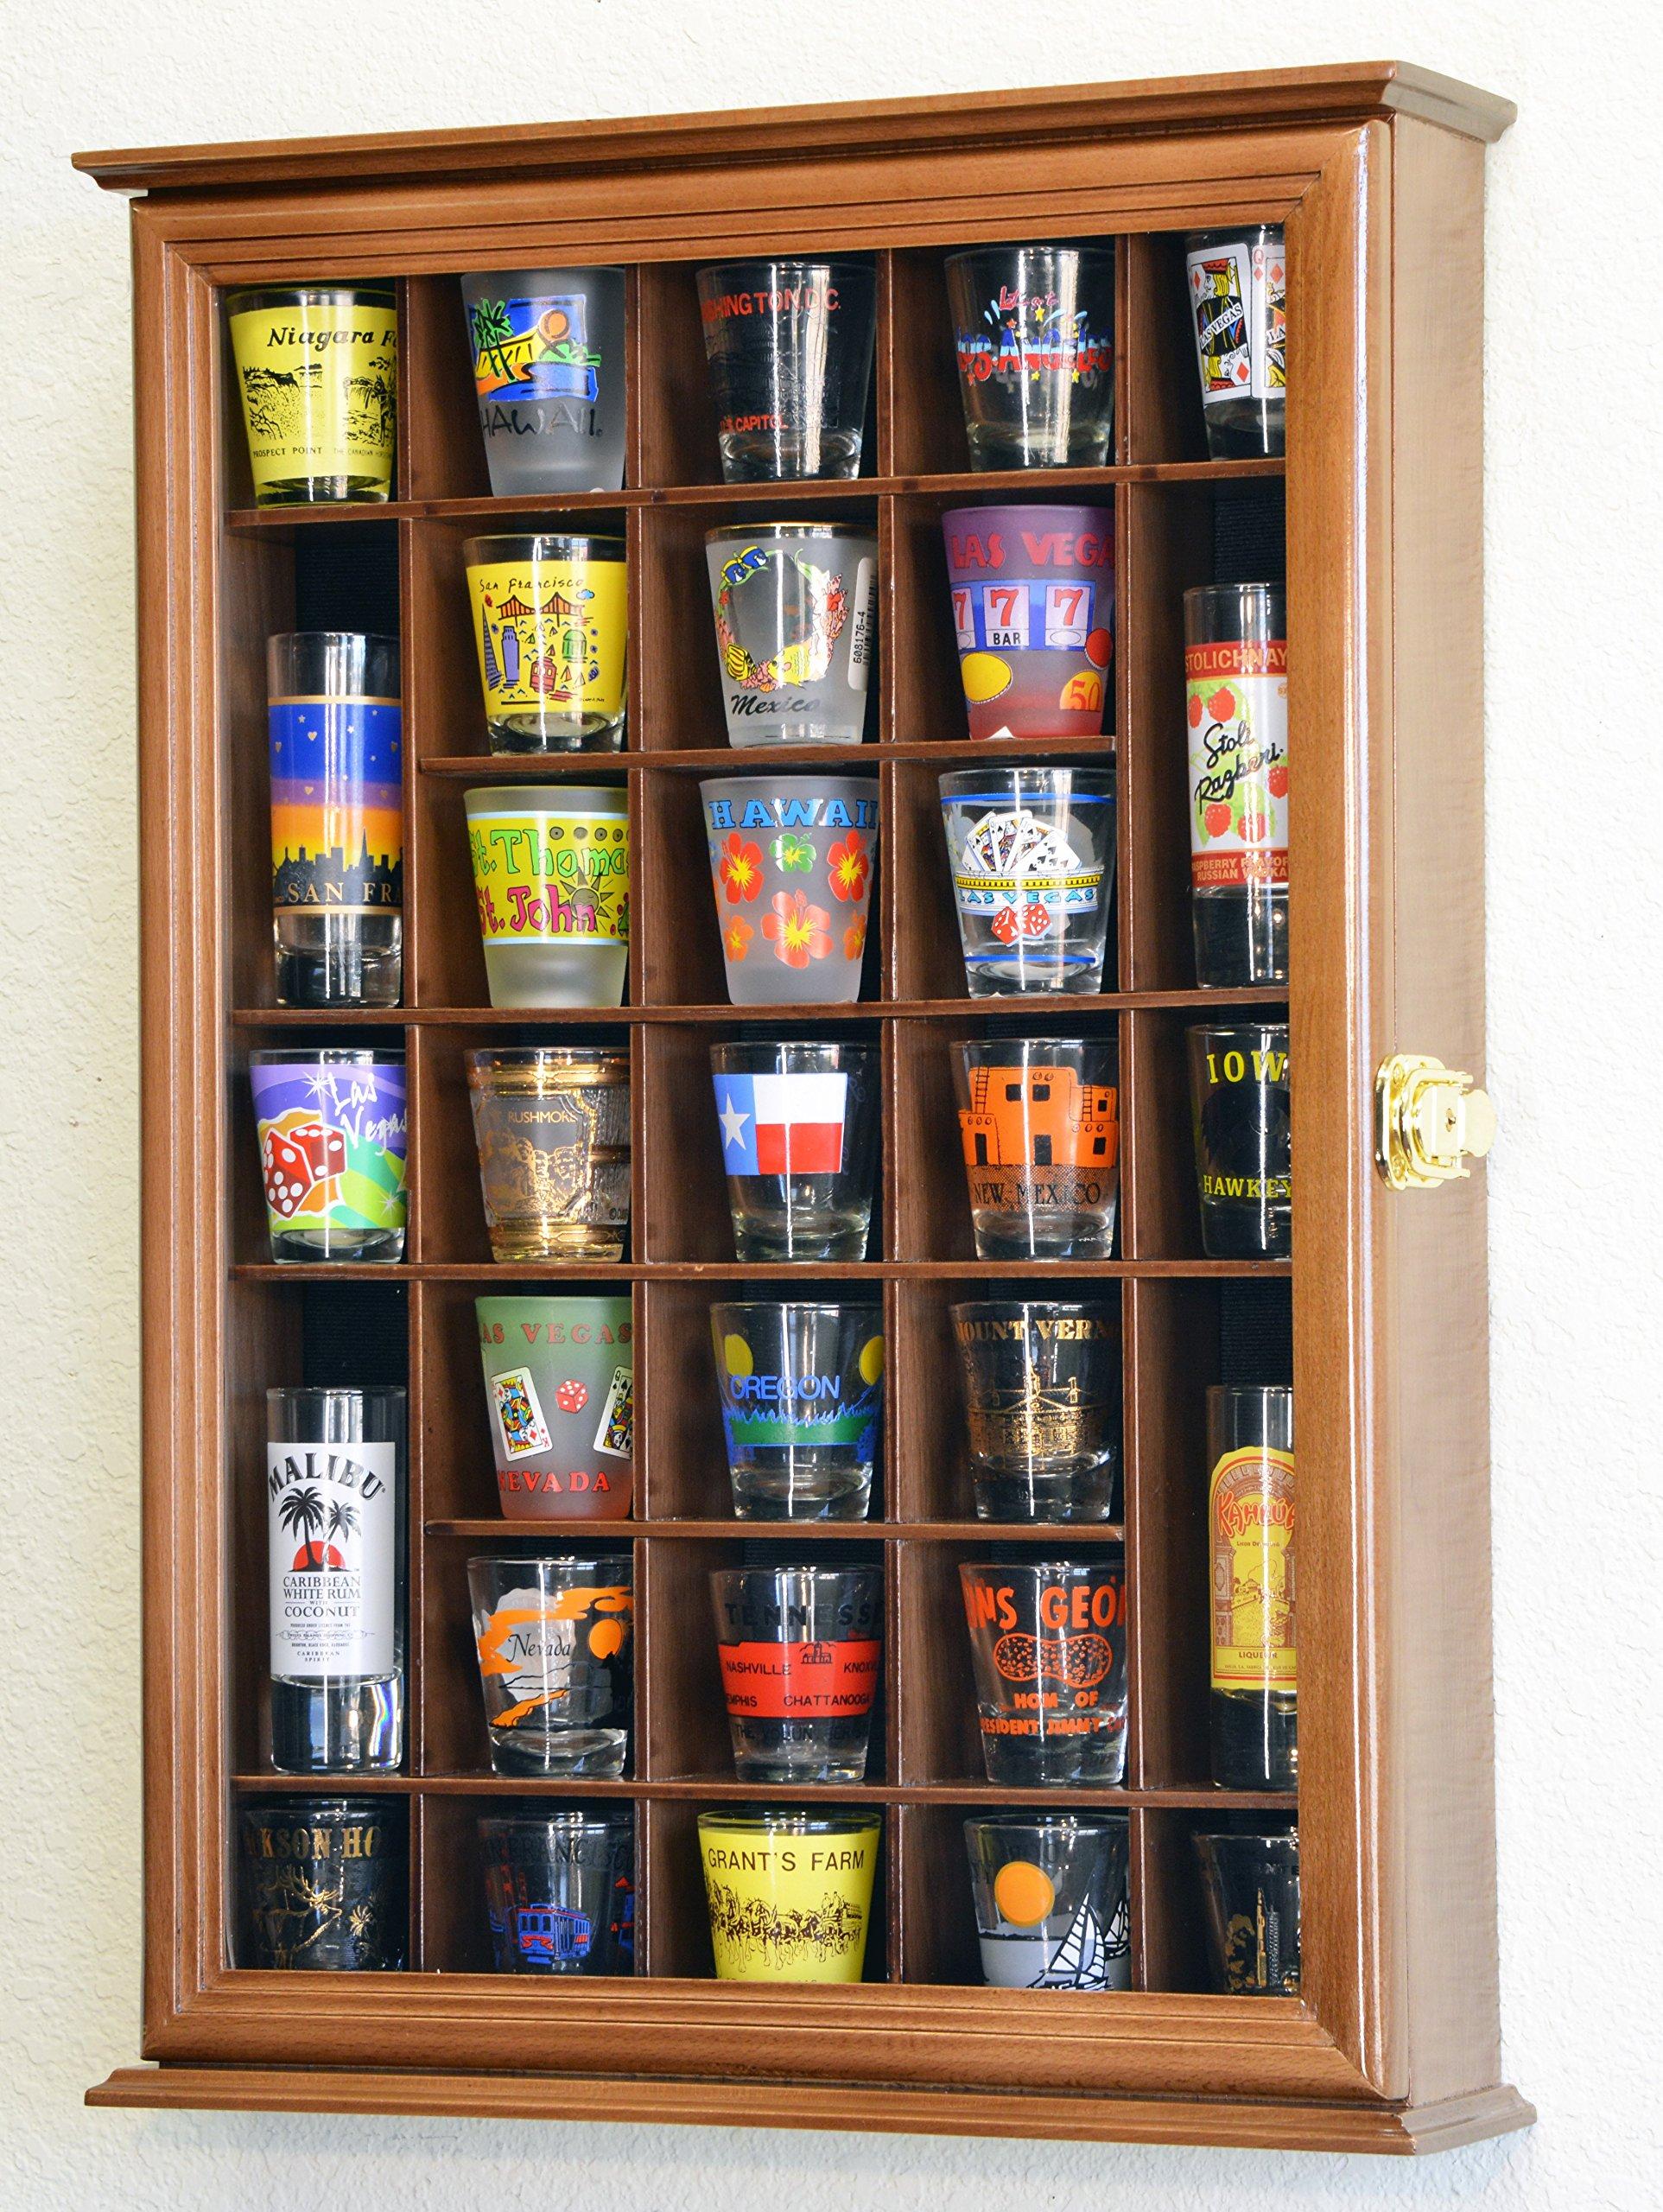 31 Shot Glass Shotglass Shooter Display Case Holder Cabinet Wall Rack -Walnut